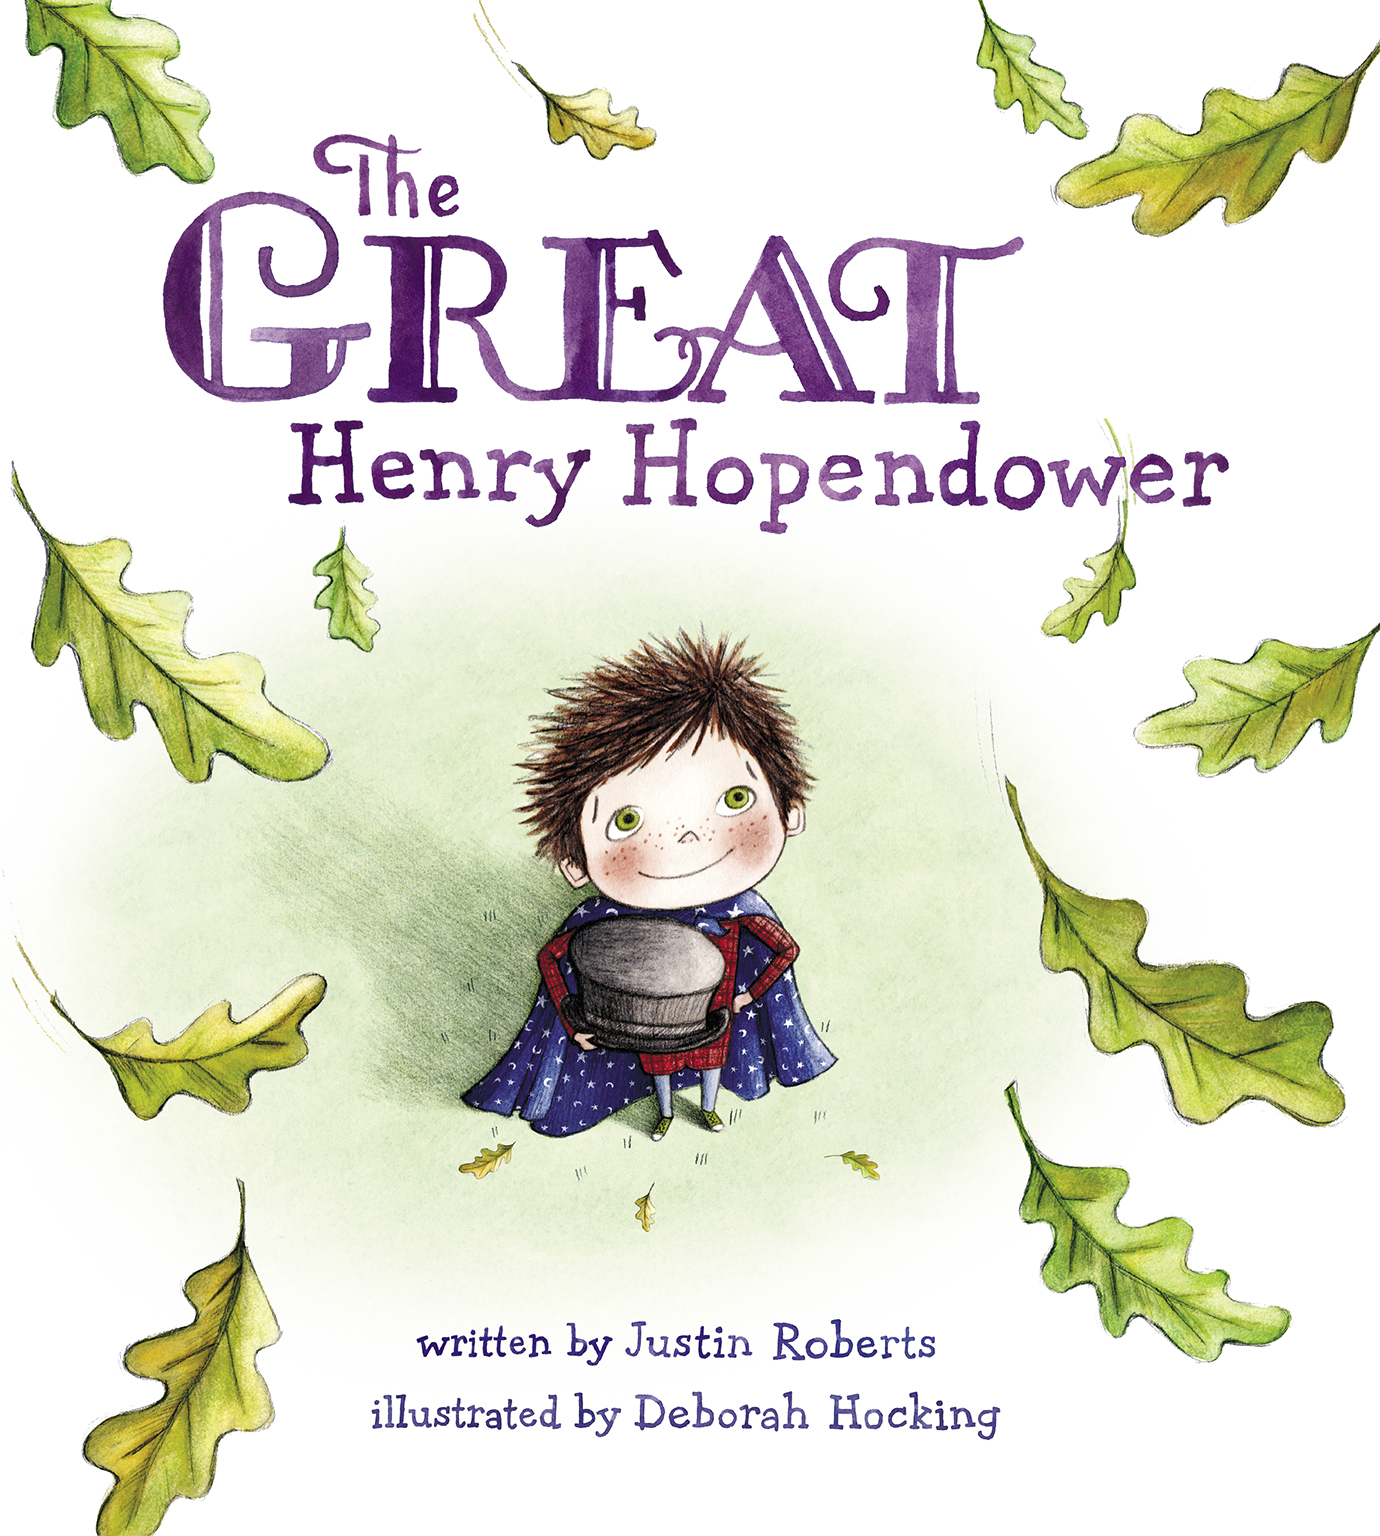 Hocking, Deborah 2017_06 - THE GREAT HENRY HOPENDOWER - PB - RLM LK.jpg